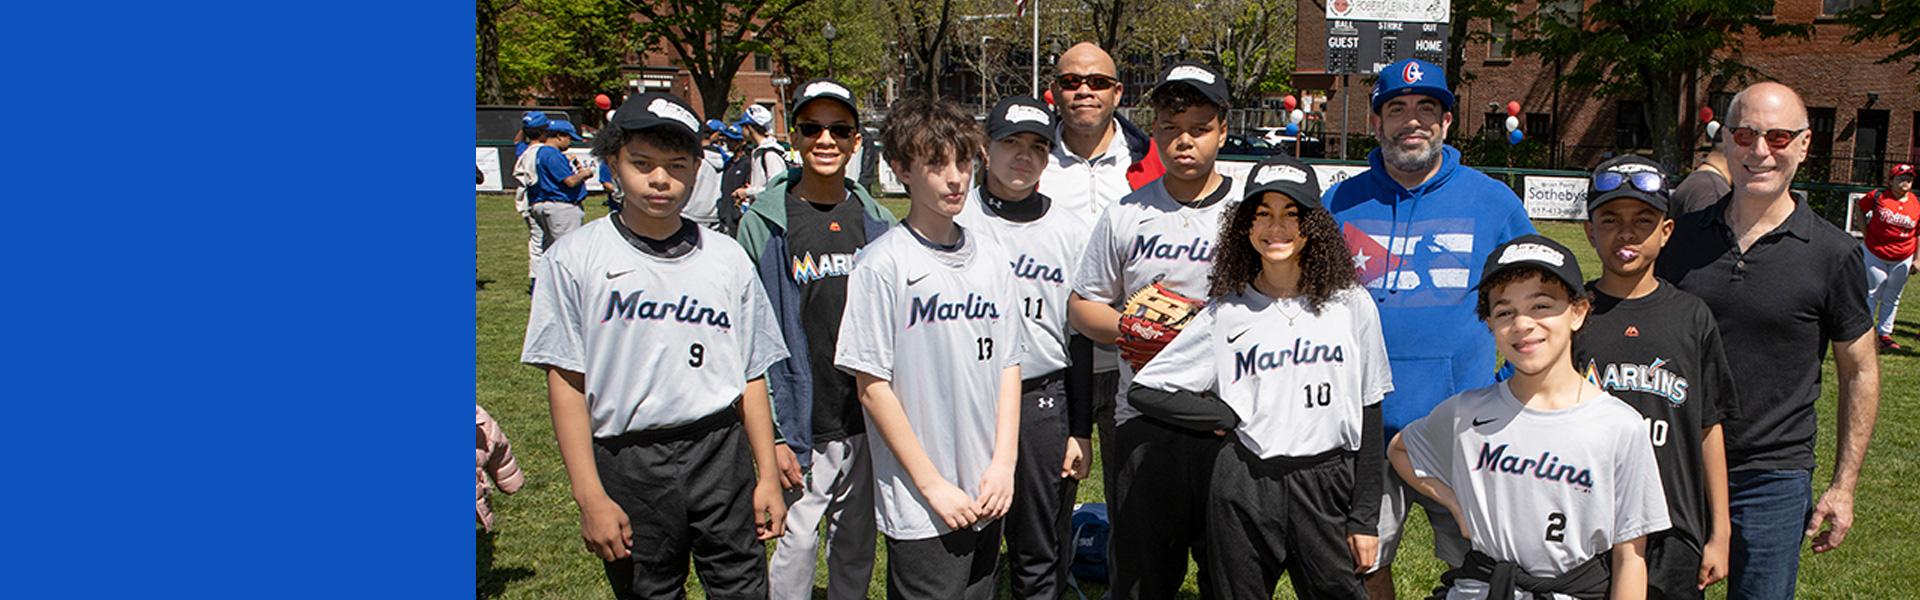 baseball on foul line